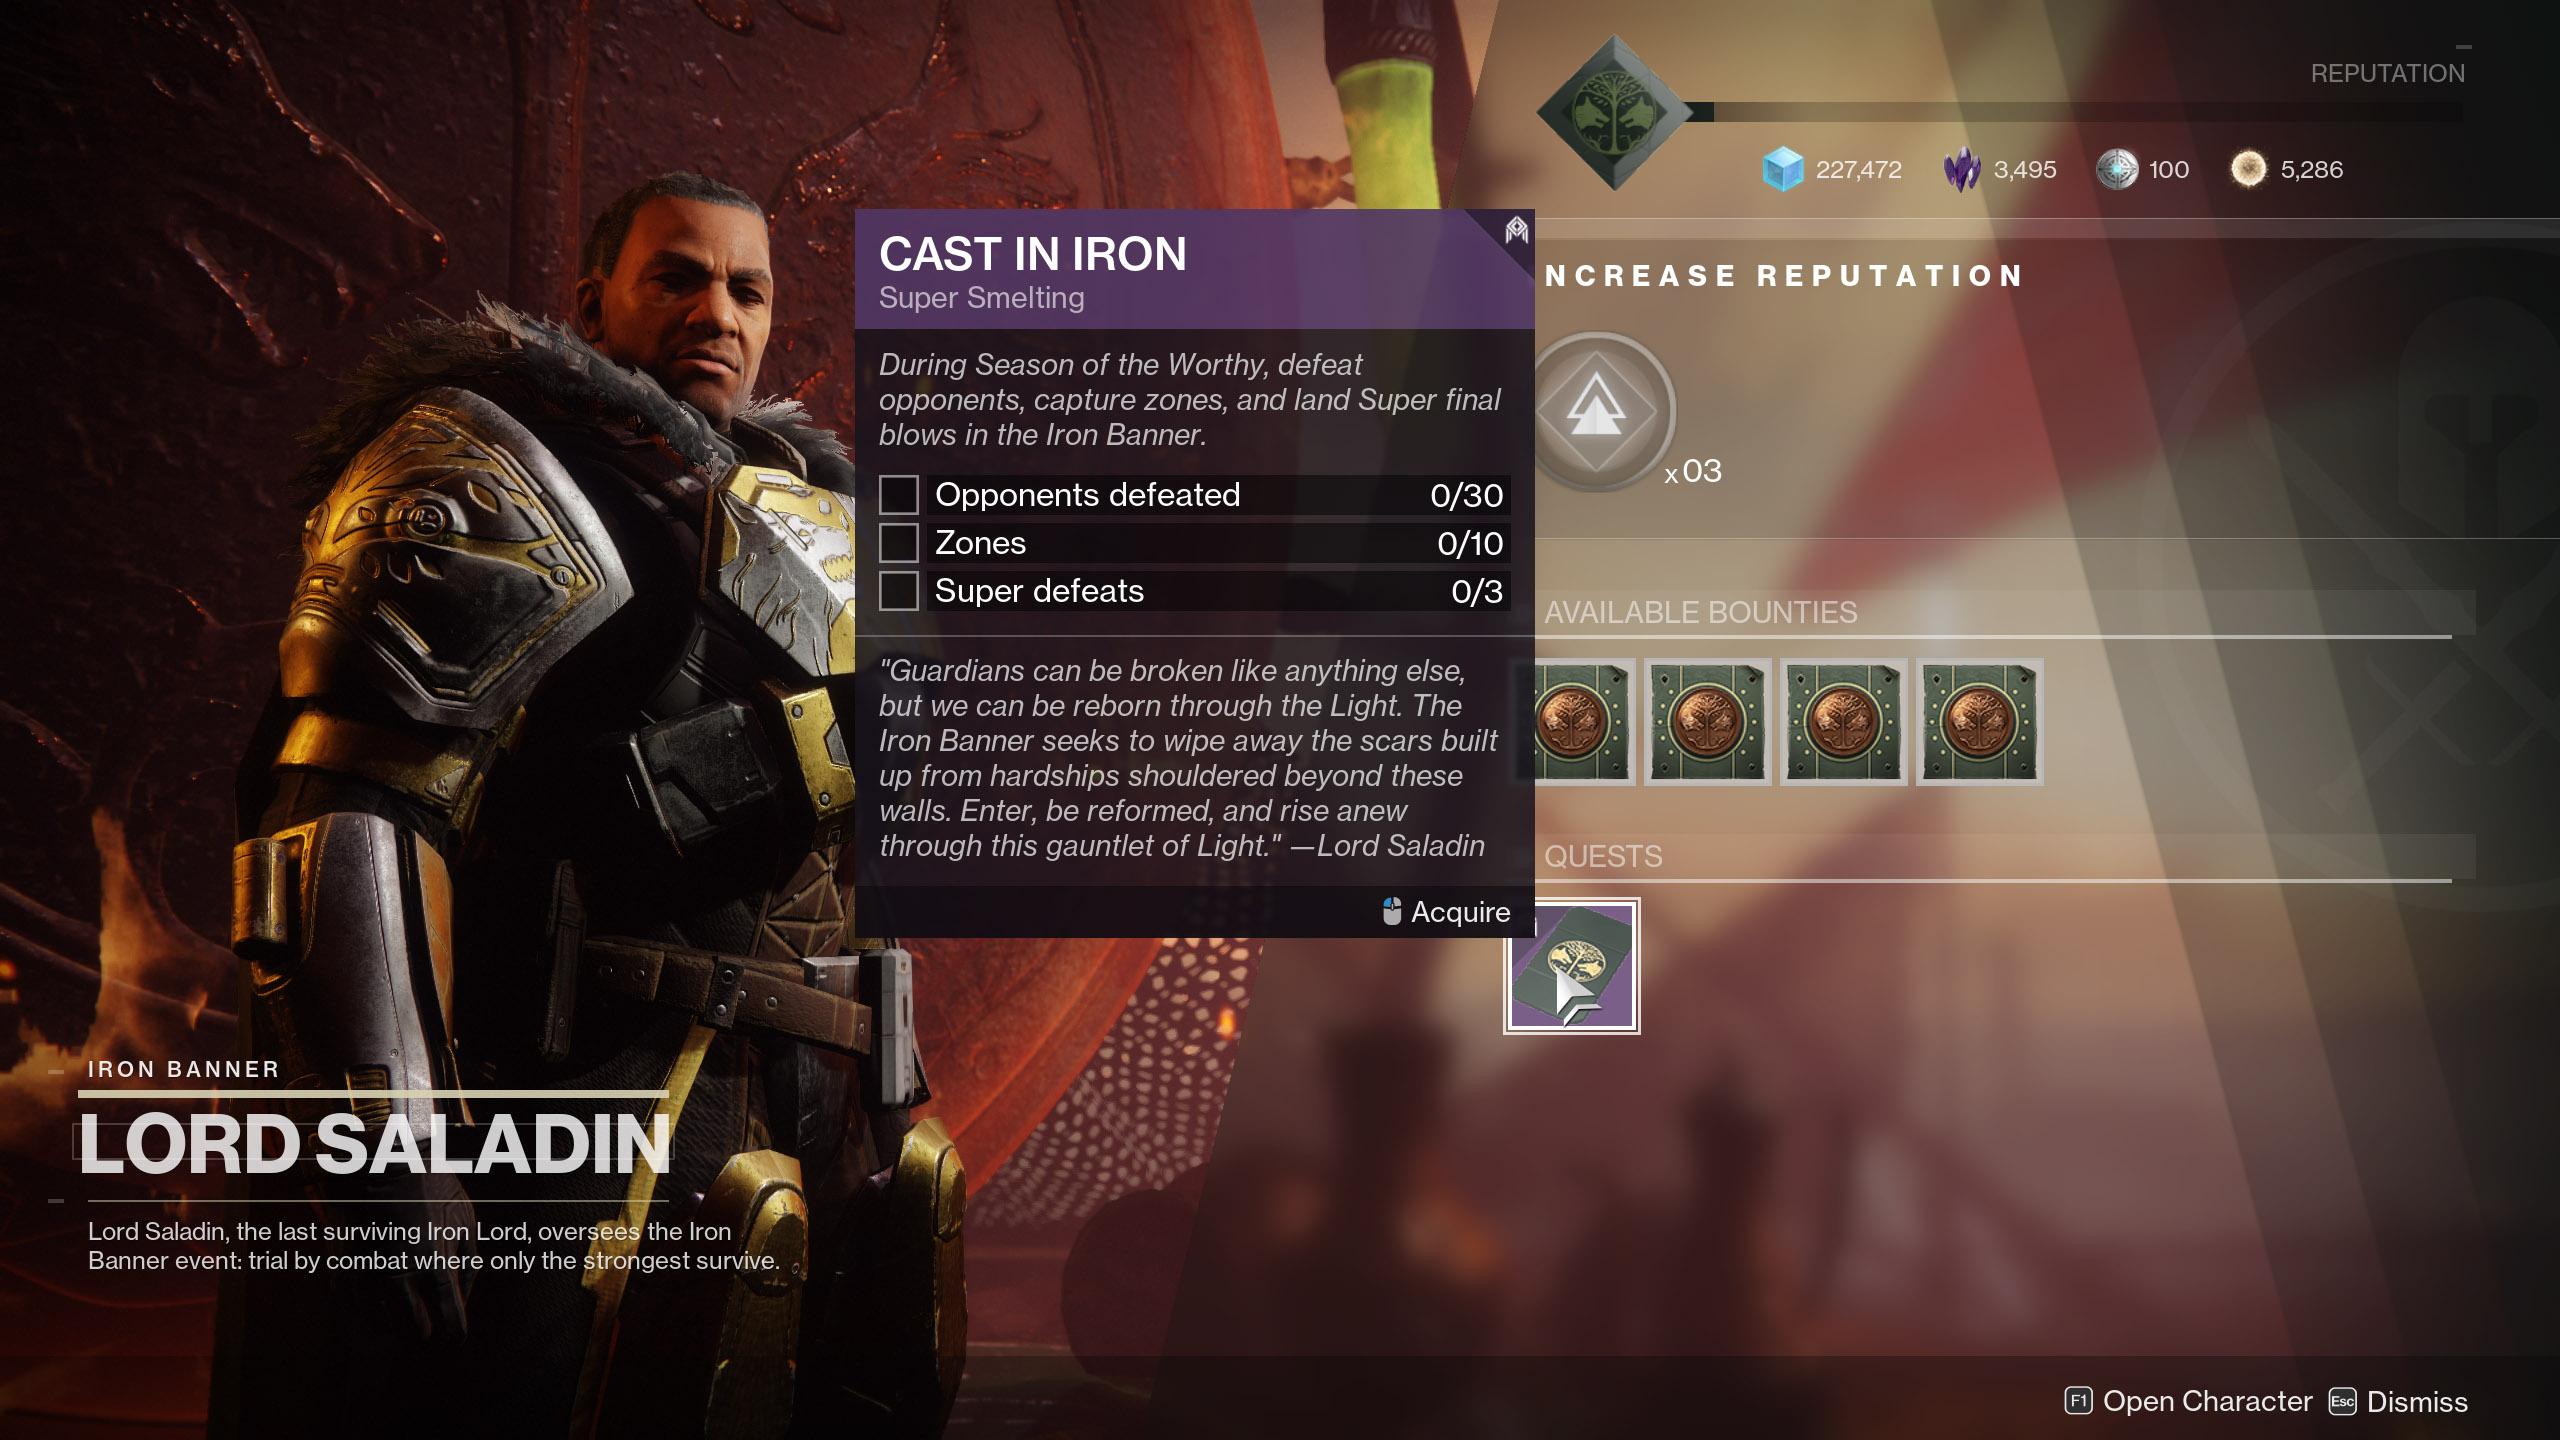 destiny 2 cast in iron